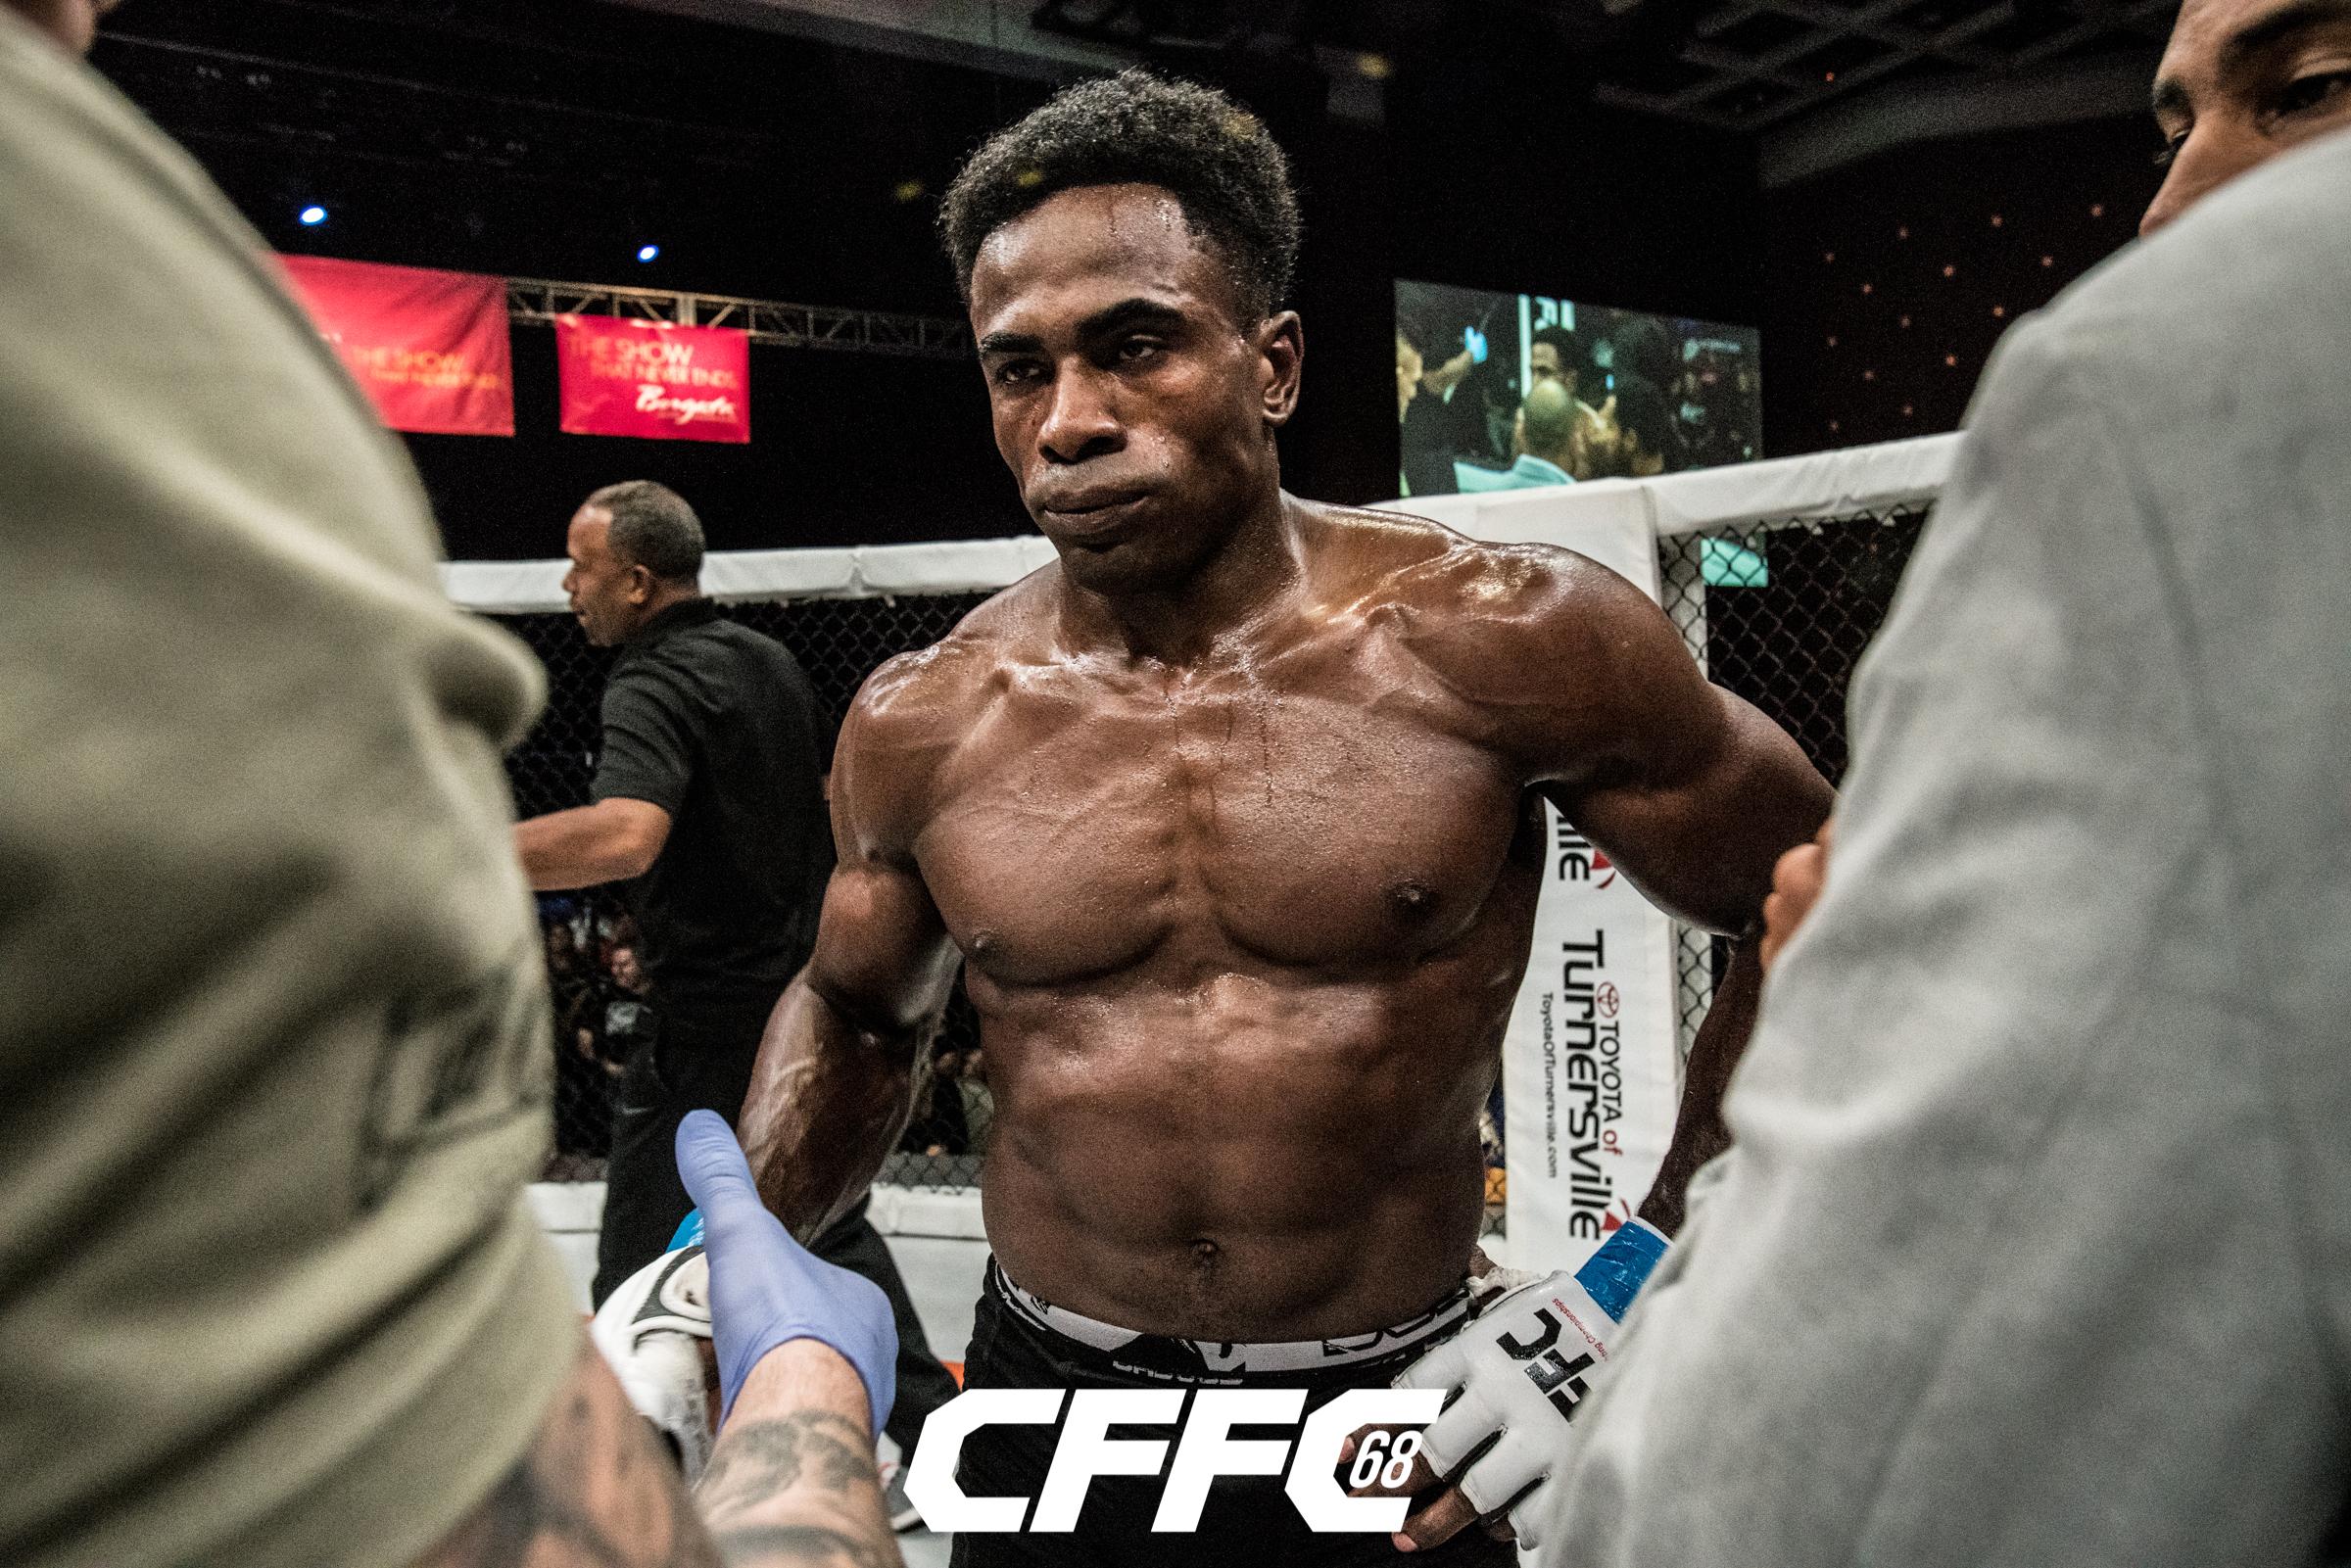 CFFC 68 Fight Night-1-6.jpg